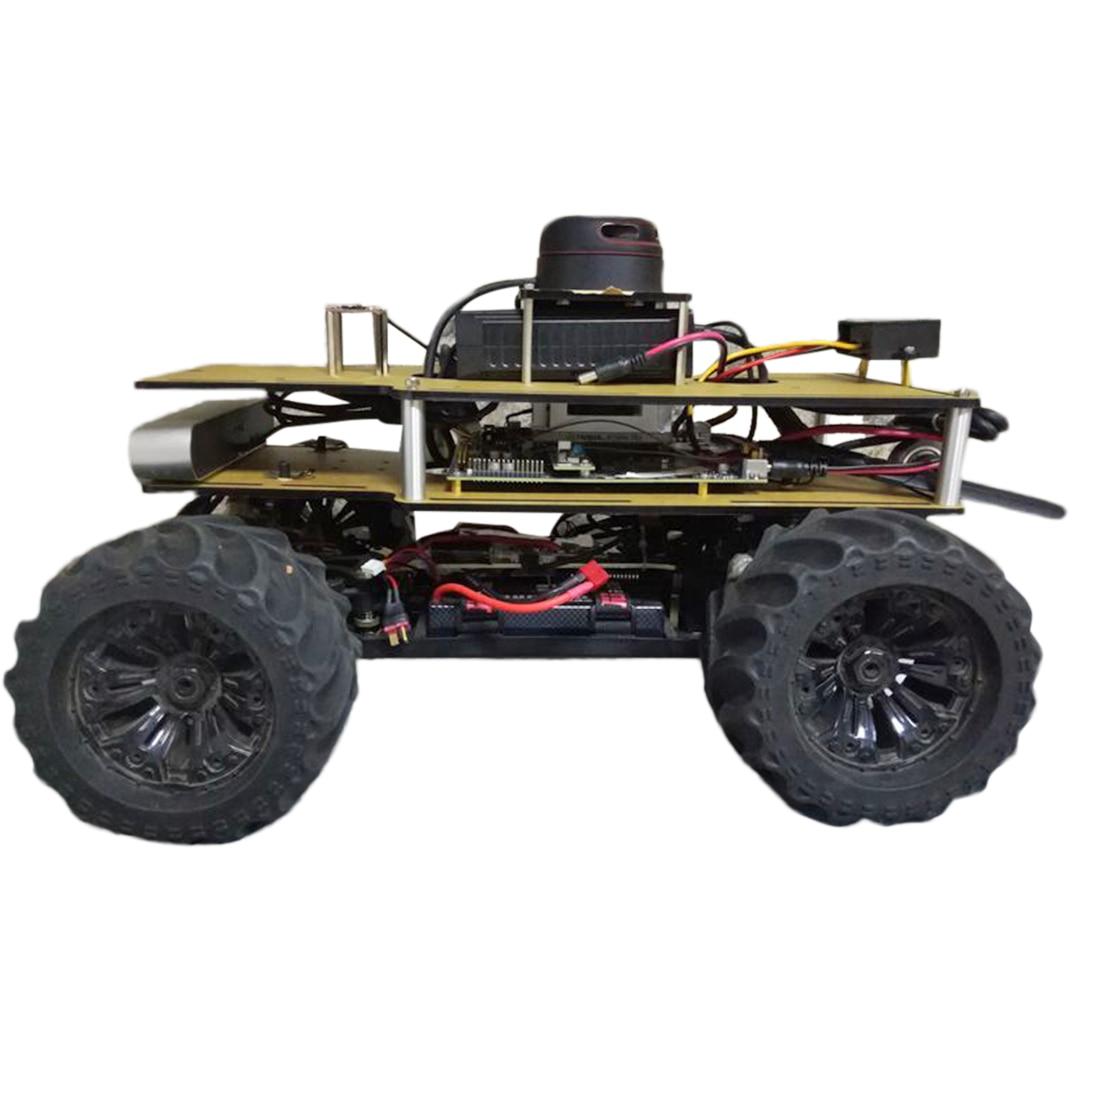 1/10 Programmable ROS Robot Ackerman Suspension Autopilot Ride Kit For Jetson TX2 Children Developmental Toys - Outdoor Version